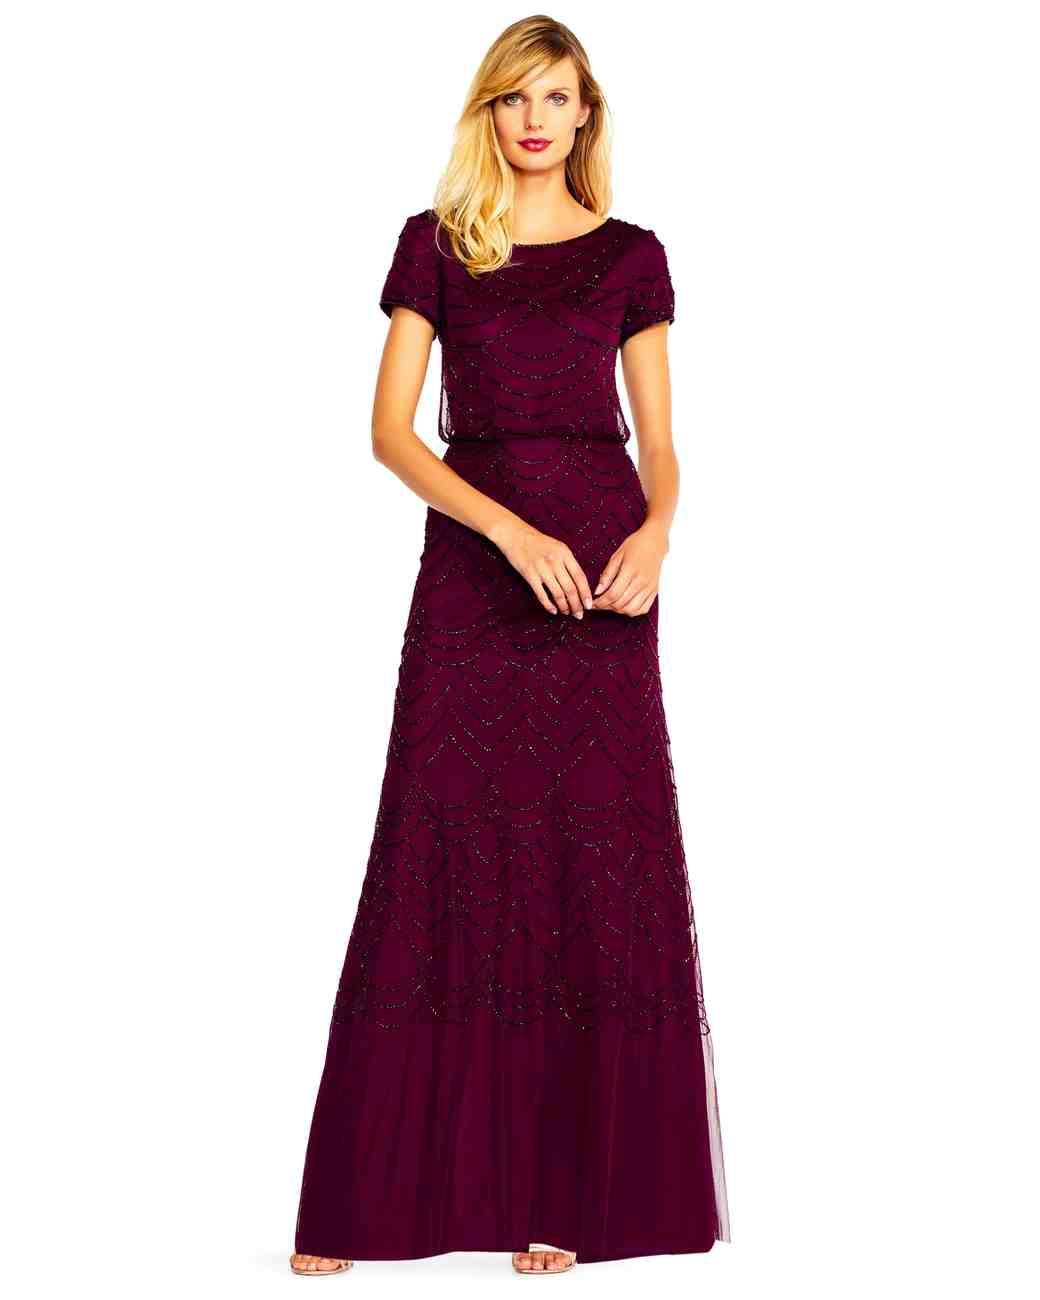 24 Burgundy Mother-of-the-Bride Dresses  fcbafcc5f2ec